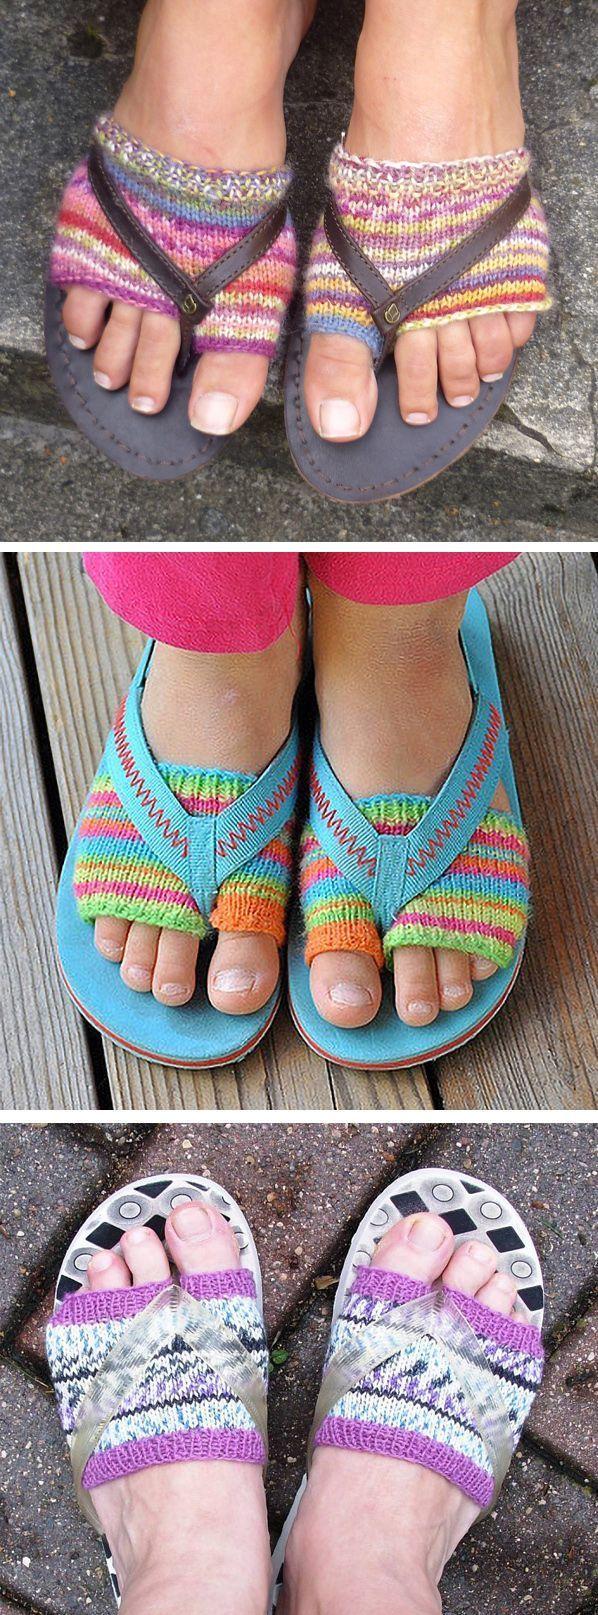 Free Knitting Pattern for Flip Flop Socks Free Knitting Pattern for Flip Flop Socks